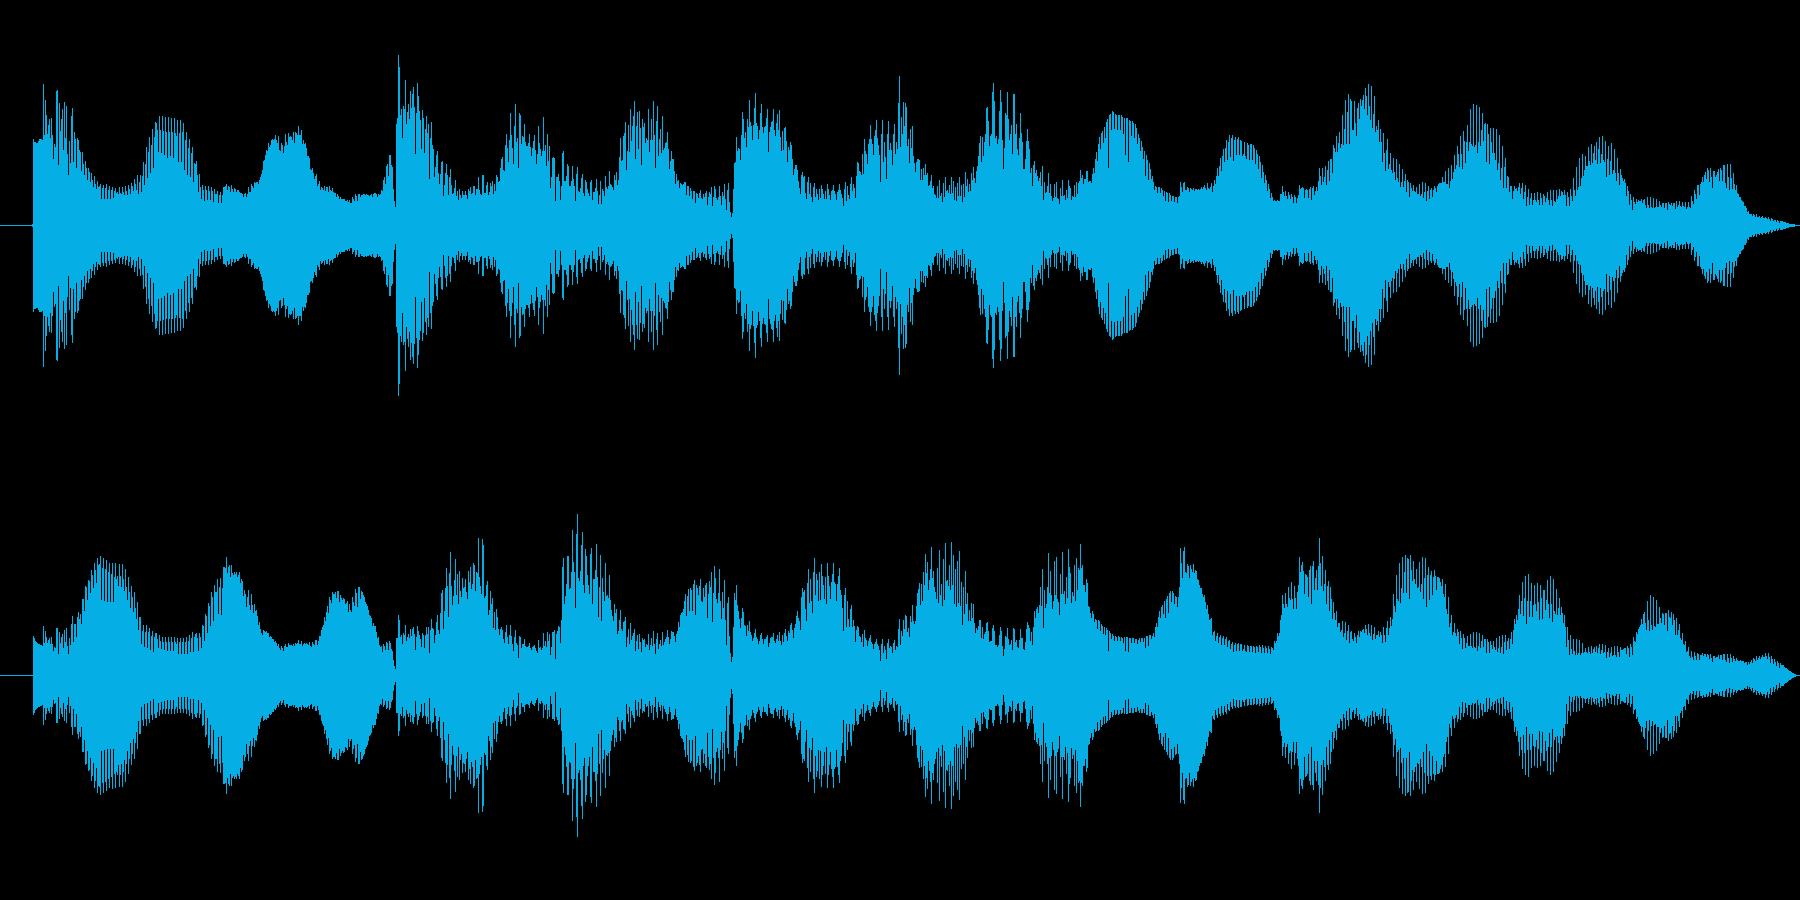 E.Piano soundの再生済みの波形